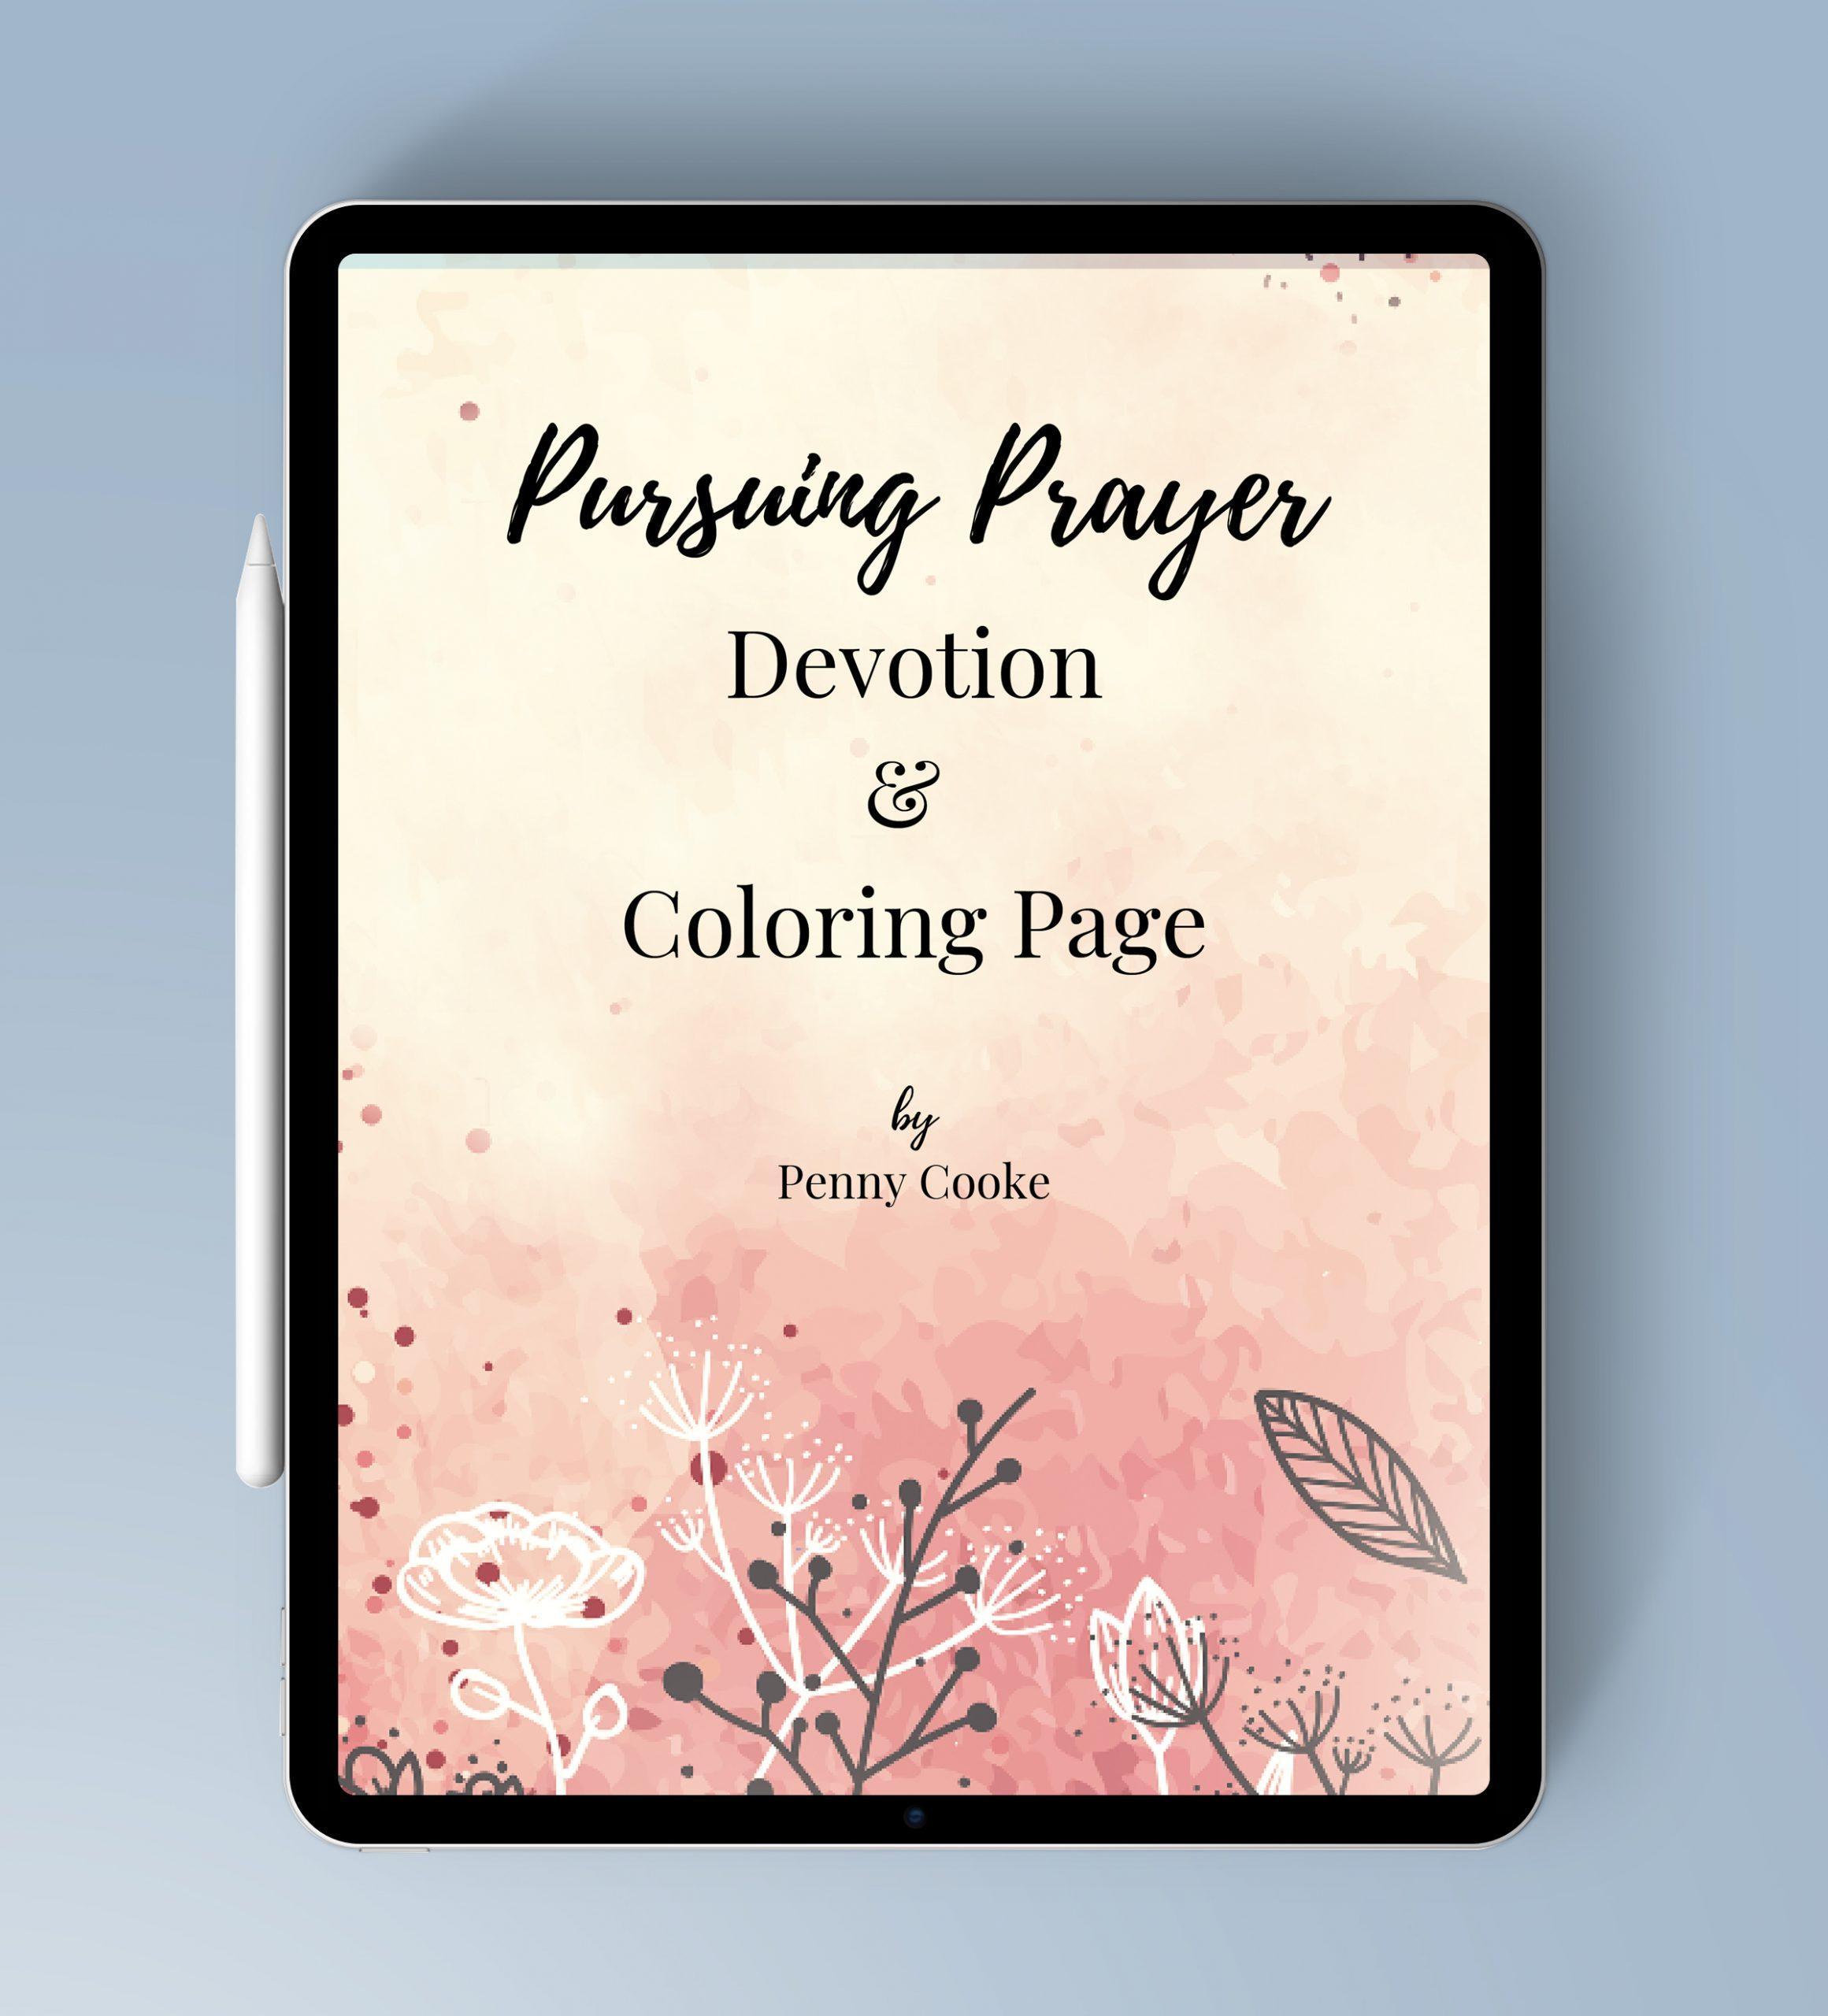 Pursuing Prayer iPad MockUp